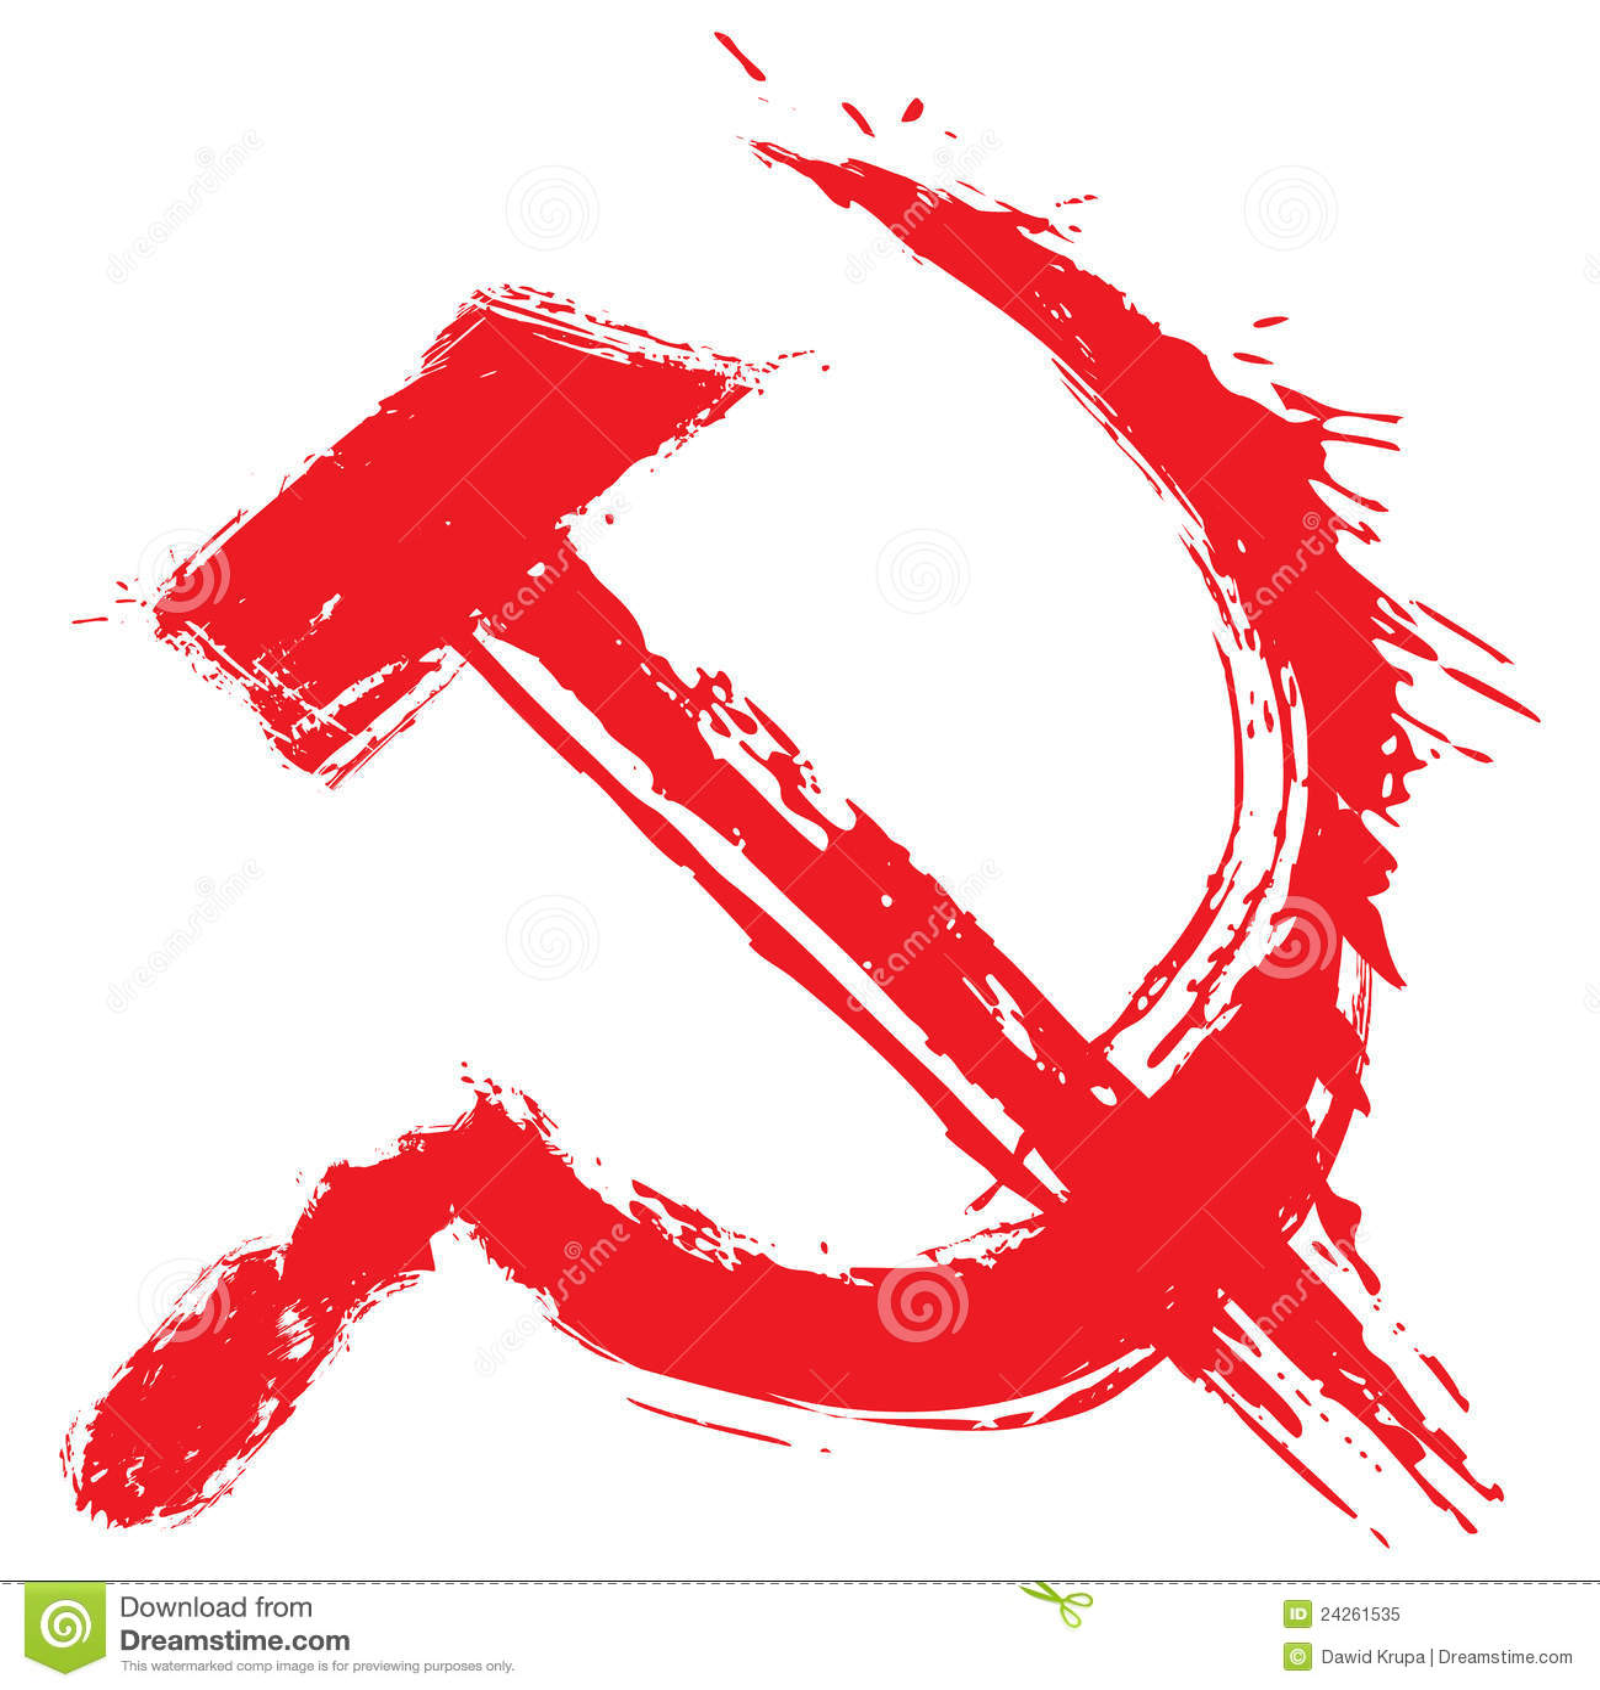 Resultado de imagen para foto de simbolos comunistas